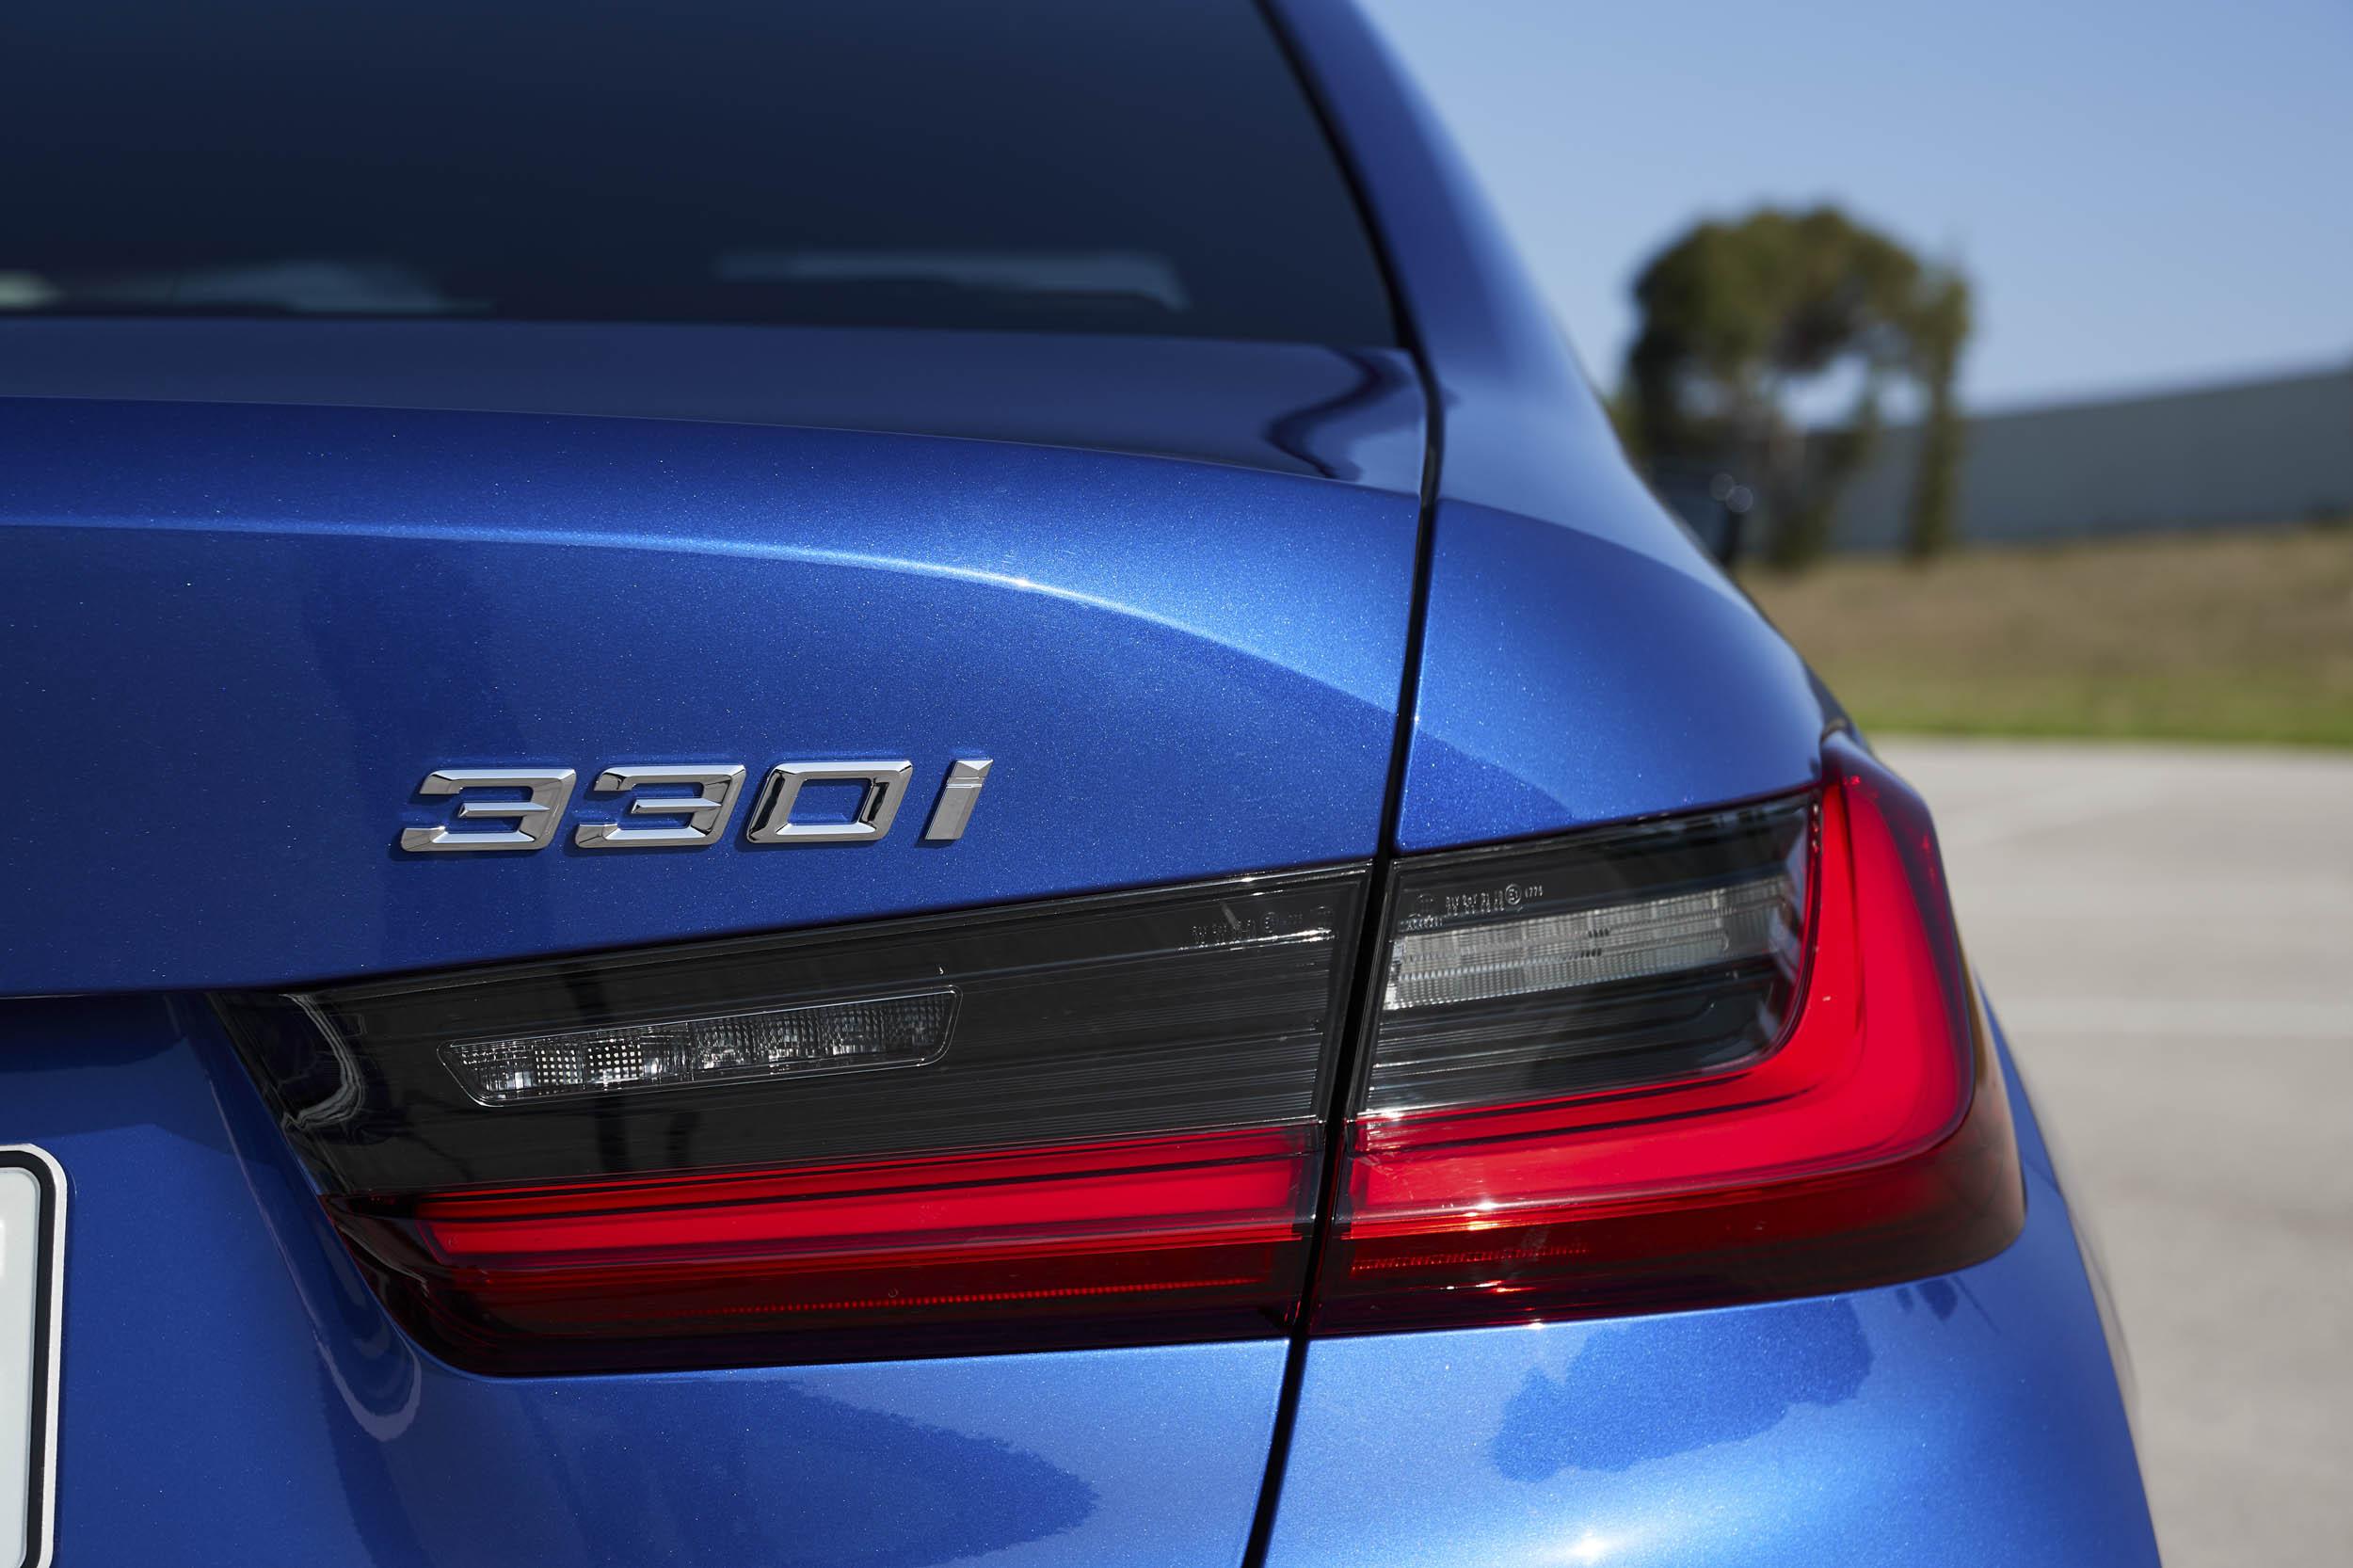 2019 BMW 330i M Sport badge